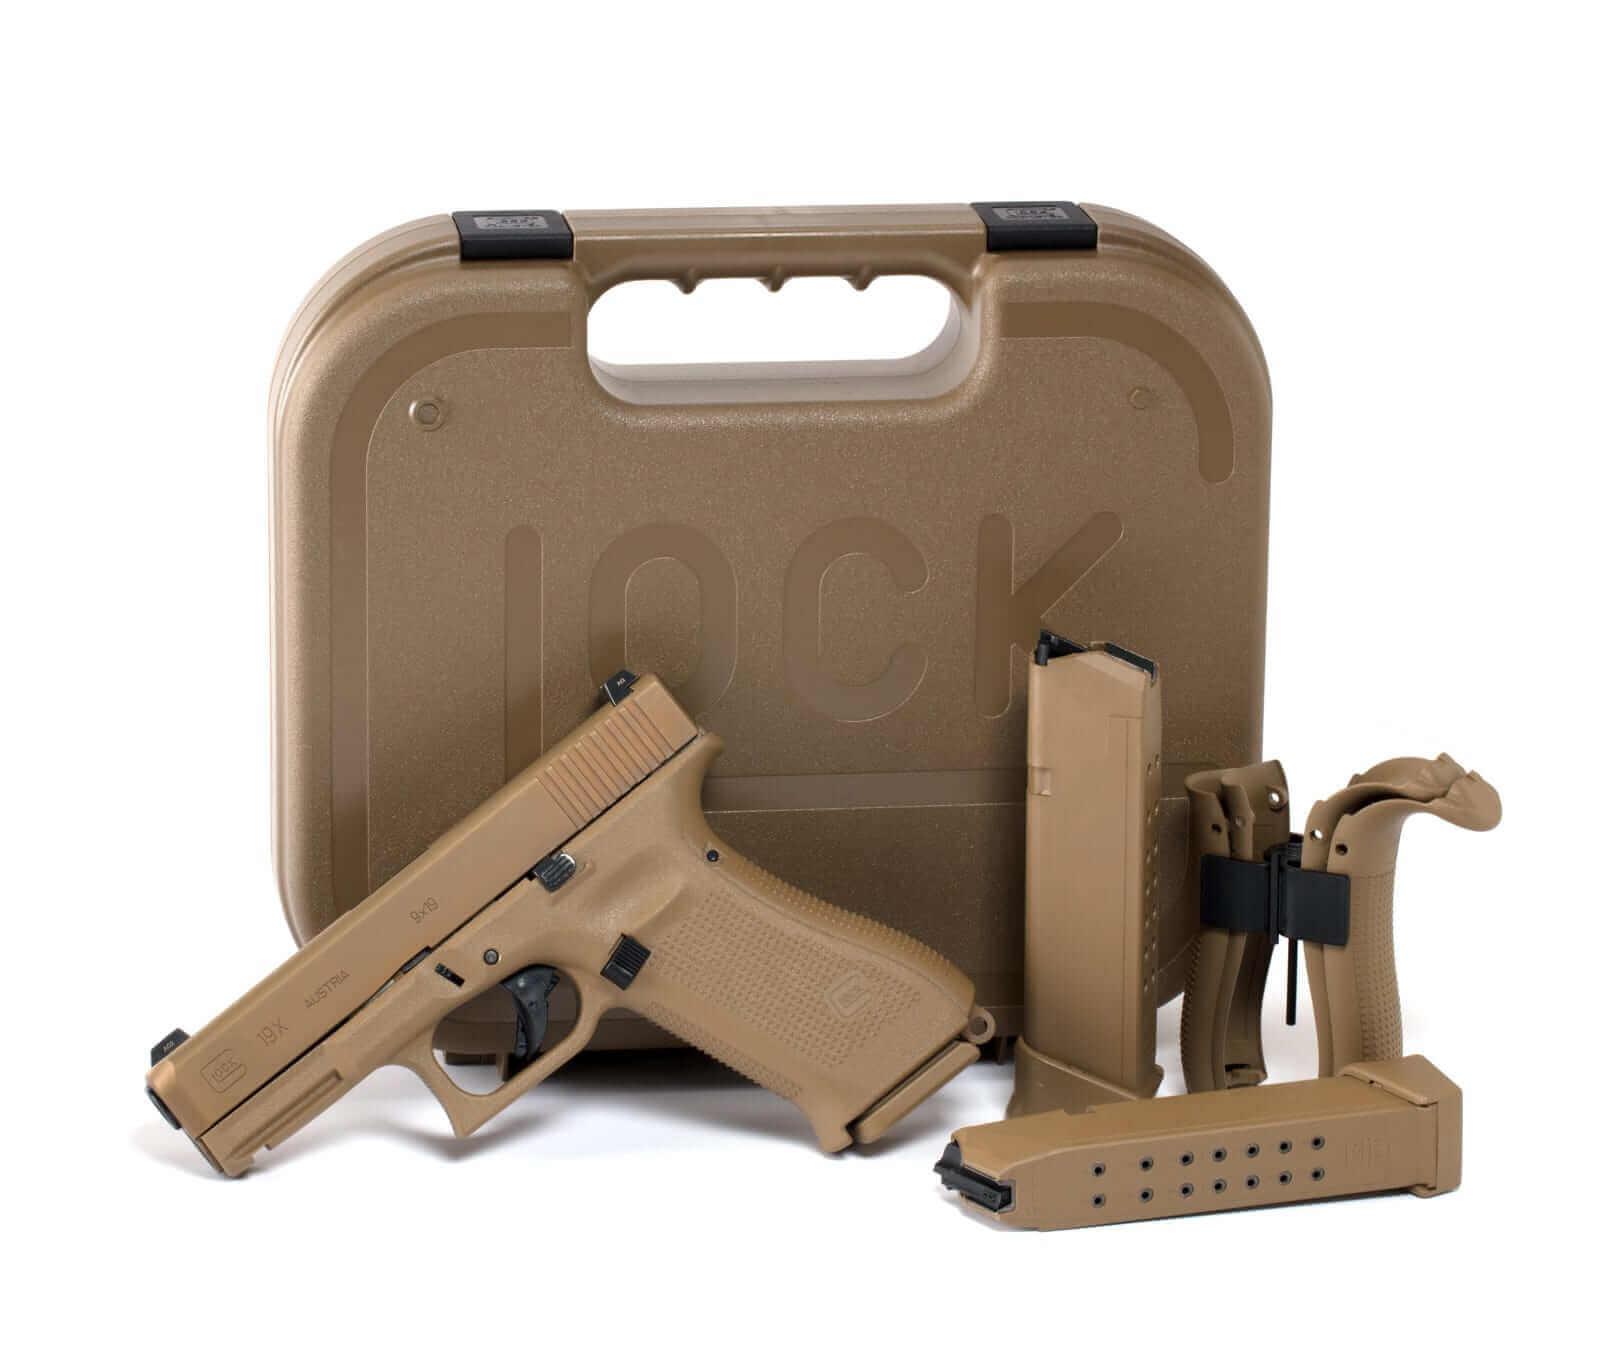 Glock 19x G19x Pistol Glock